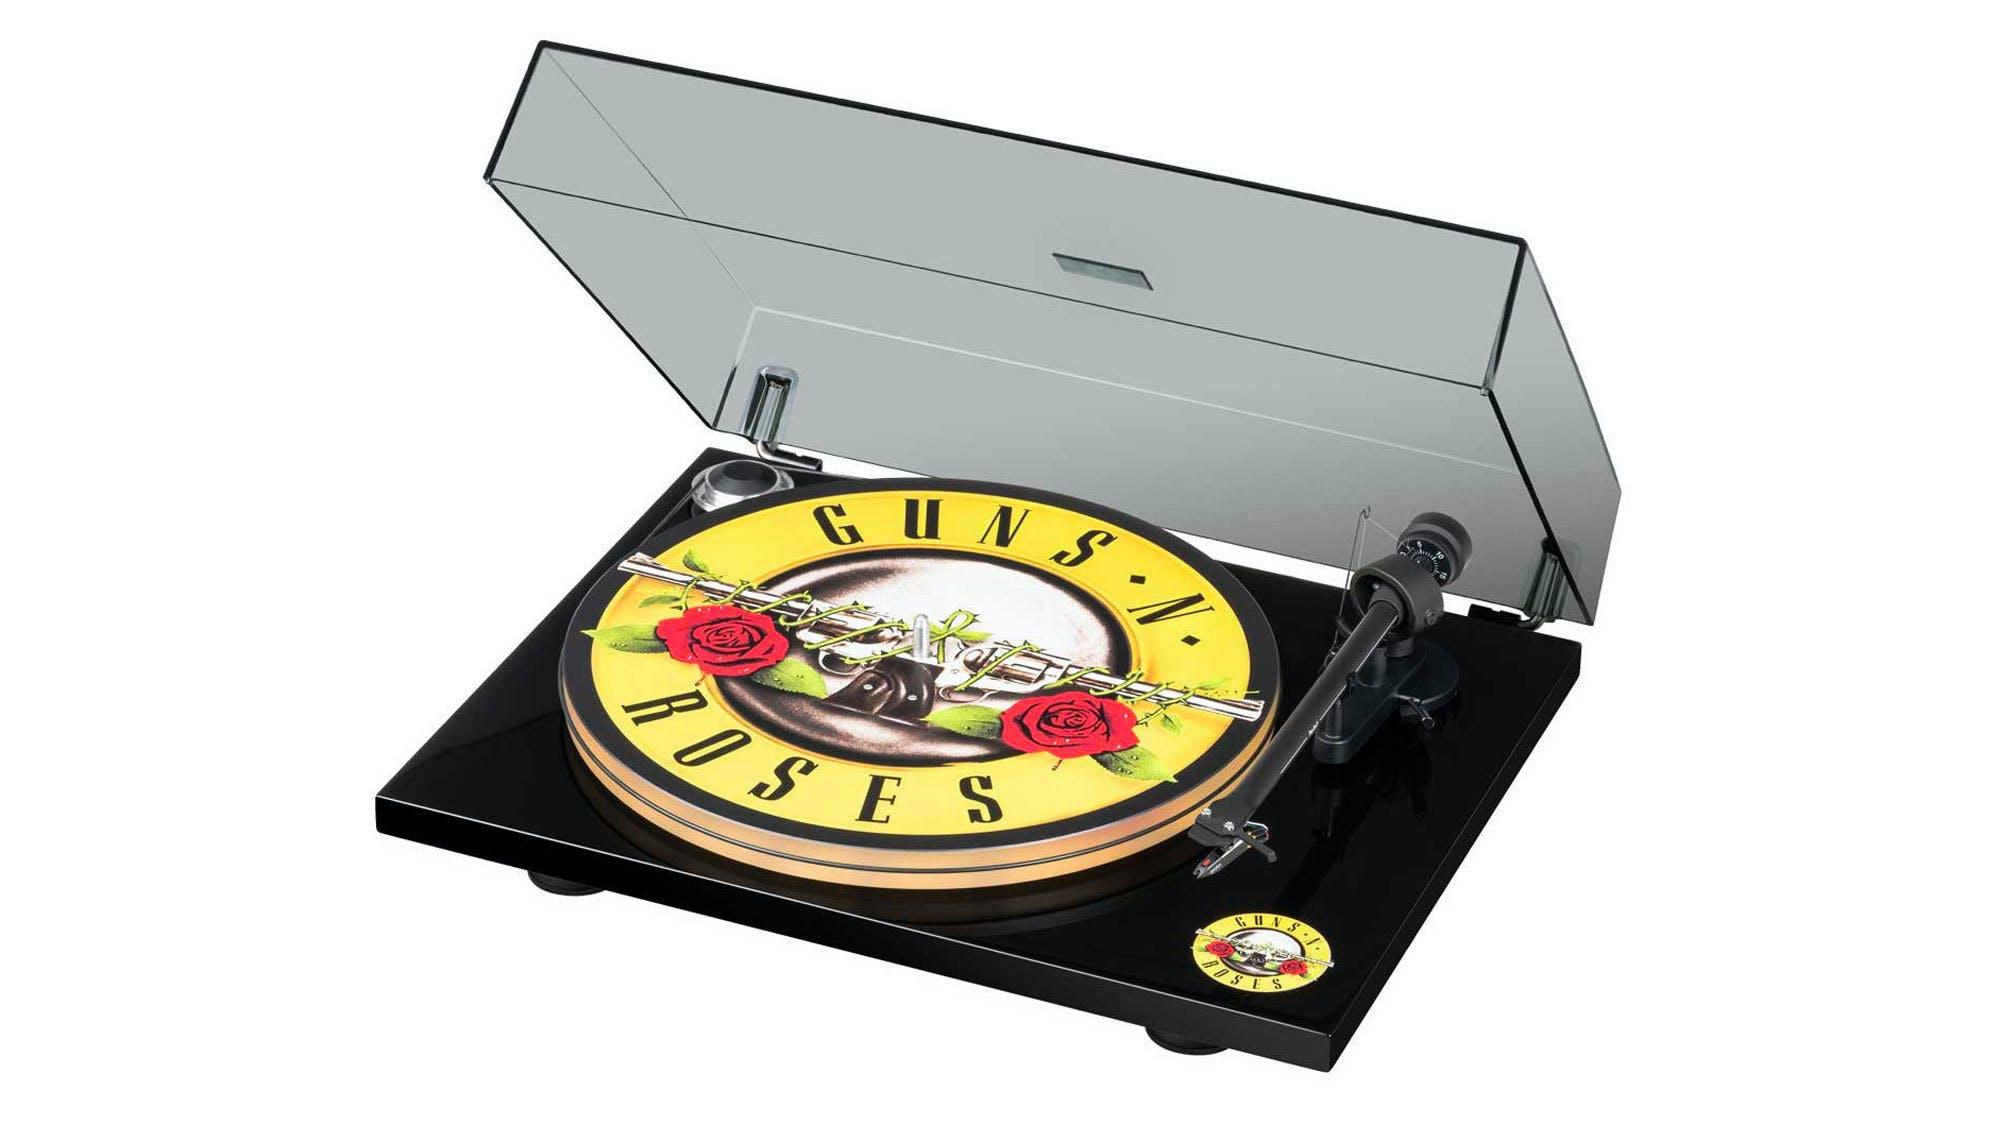 Guns N Roses turntable